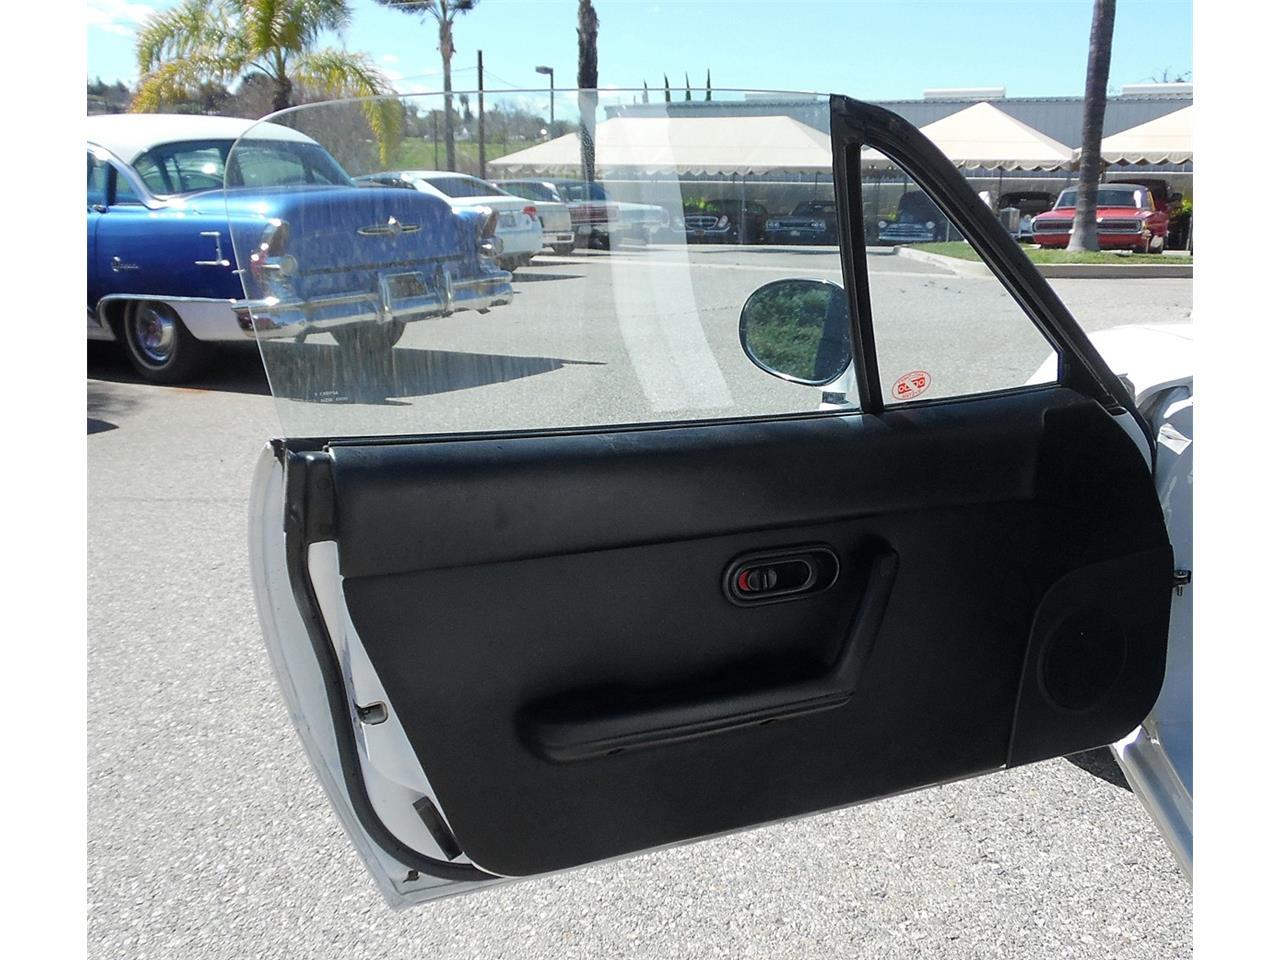 Large Picture of '90 Mazda Miata located in Redlands California - PVWW